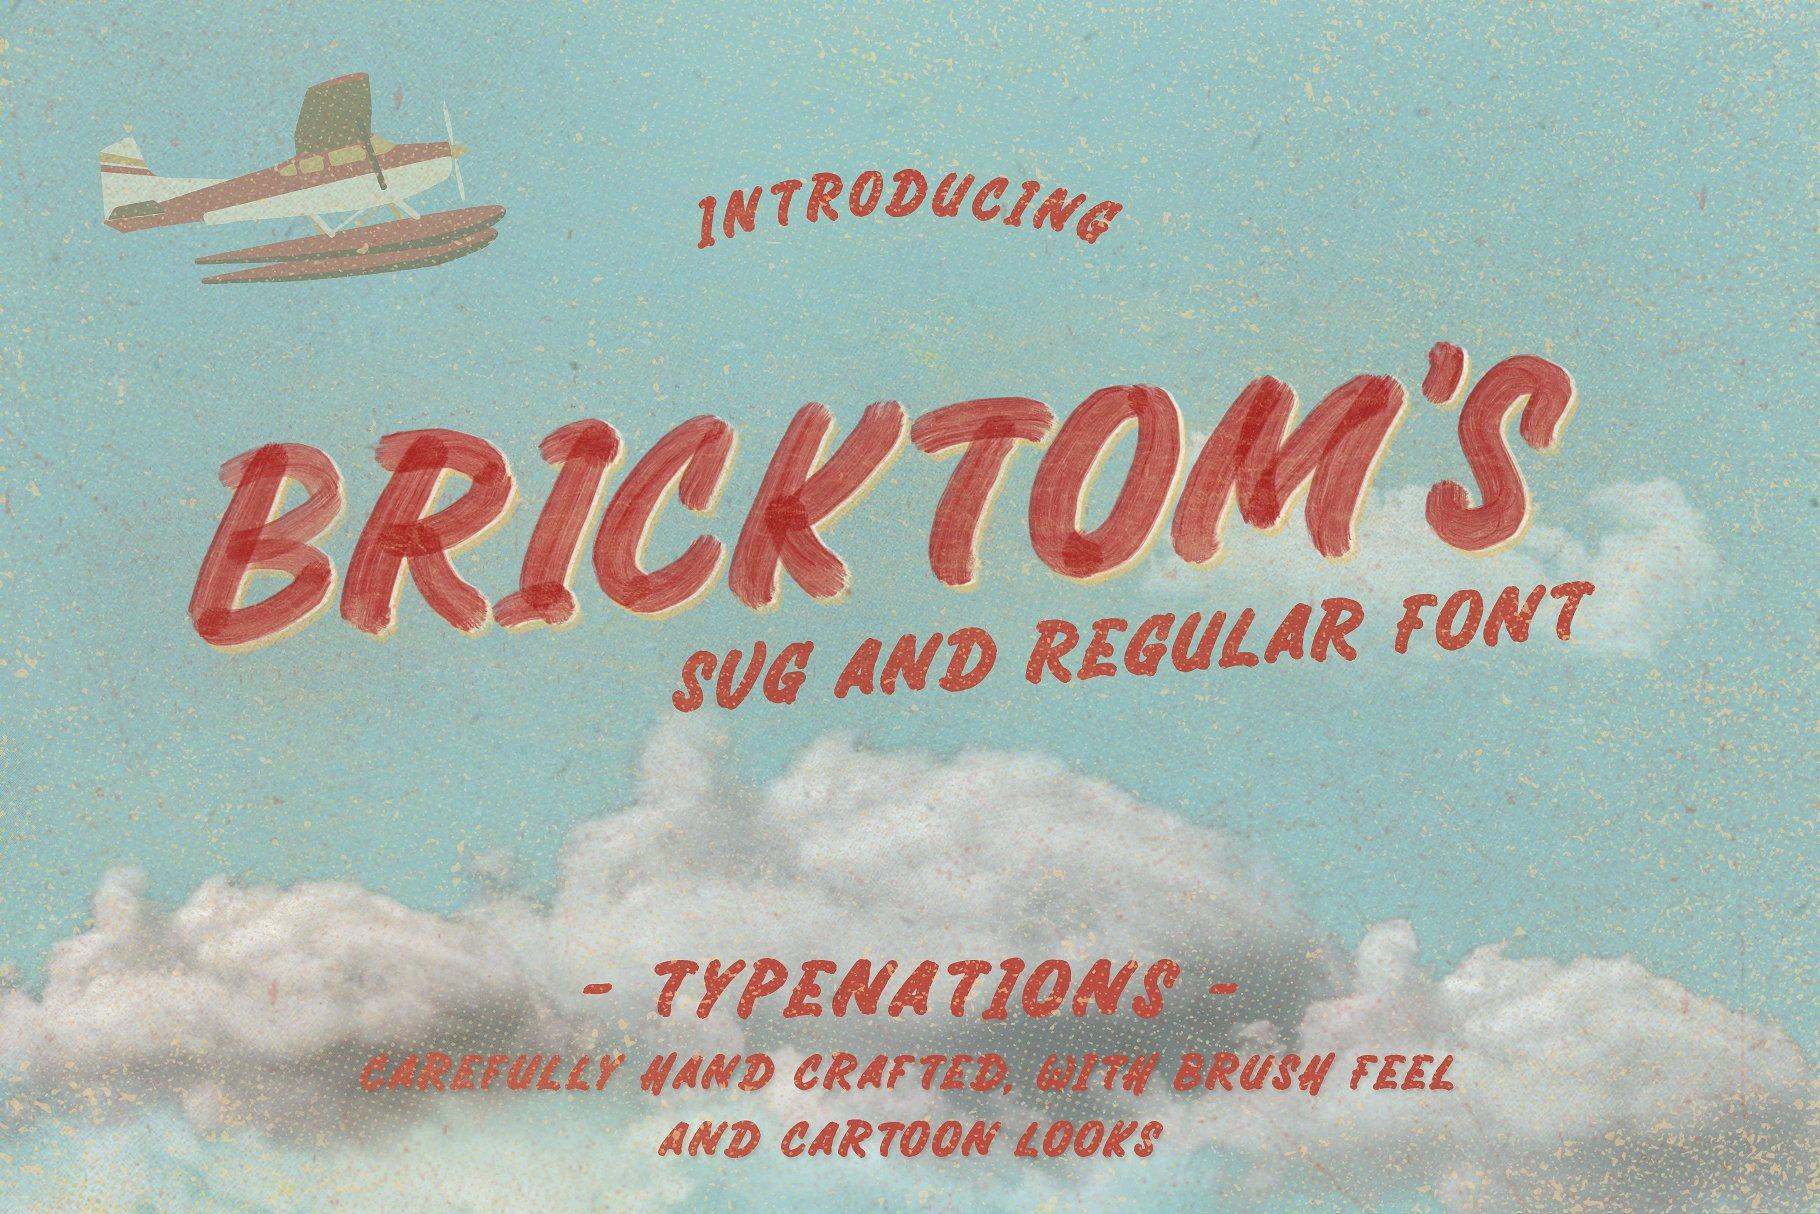 Bricktoms SVG & REGULAR example image 1